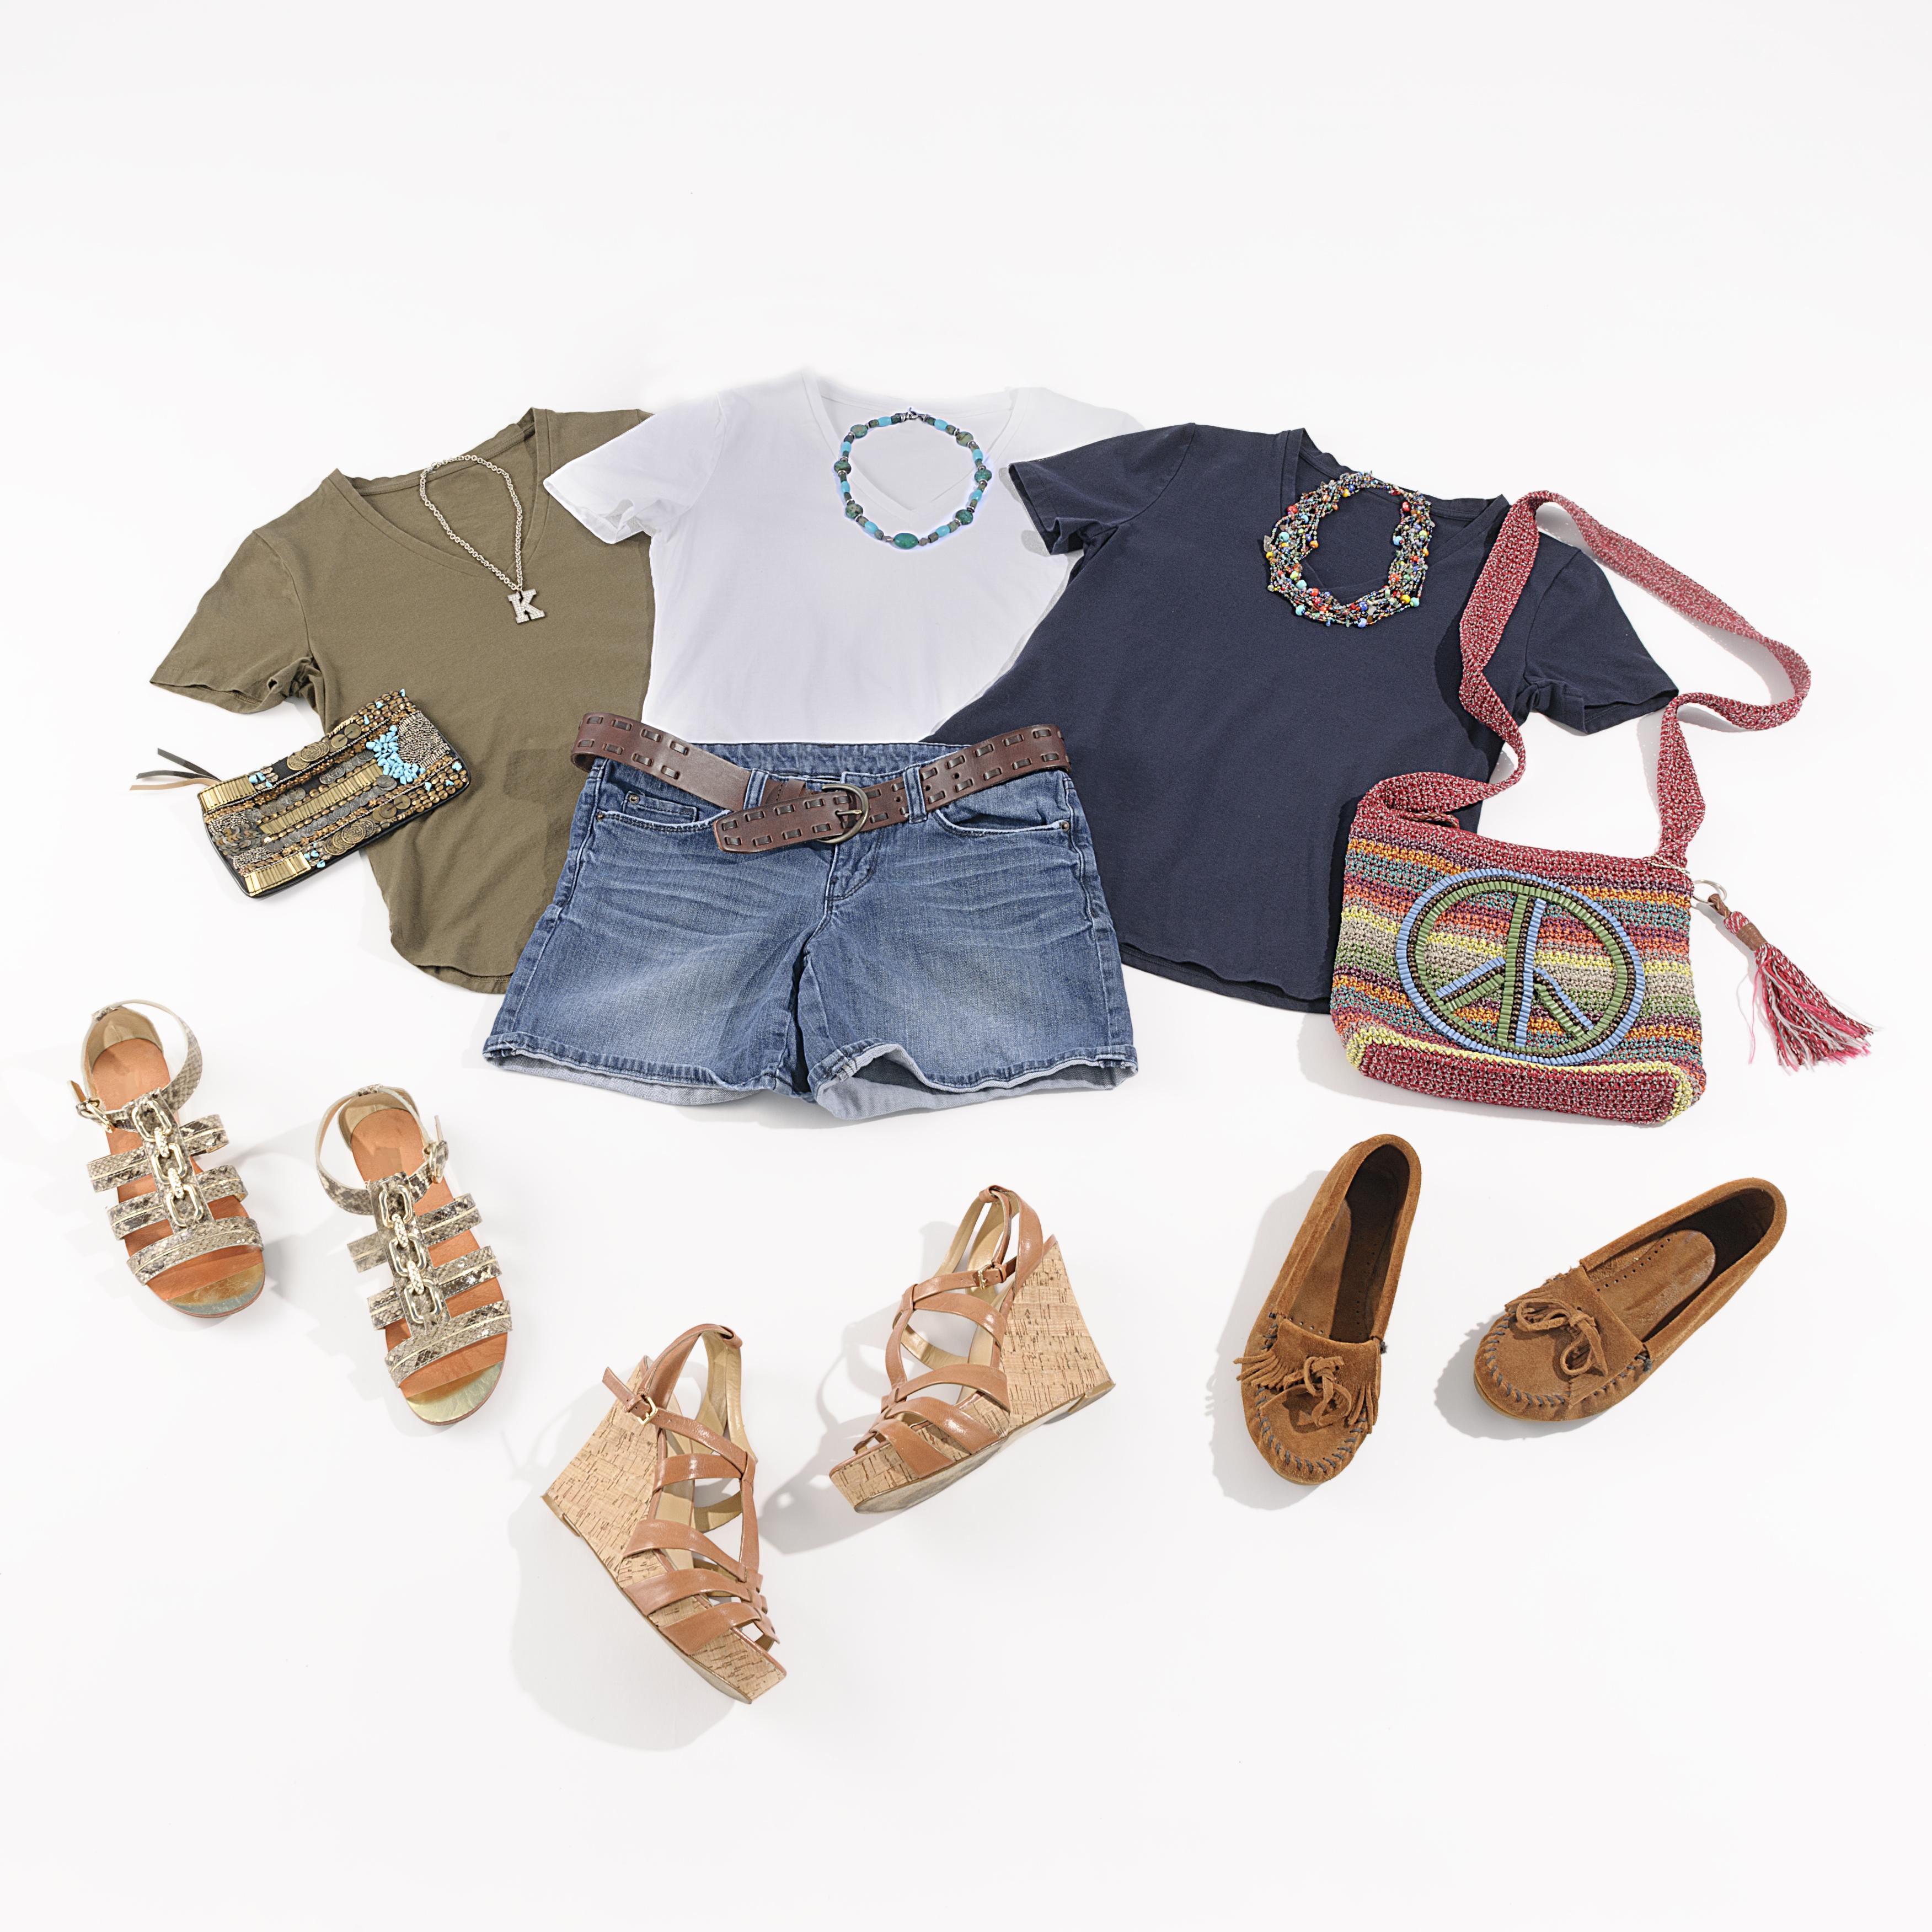 style & clothing step 9